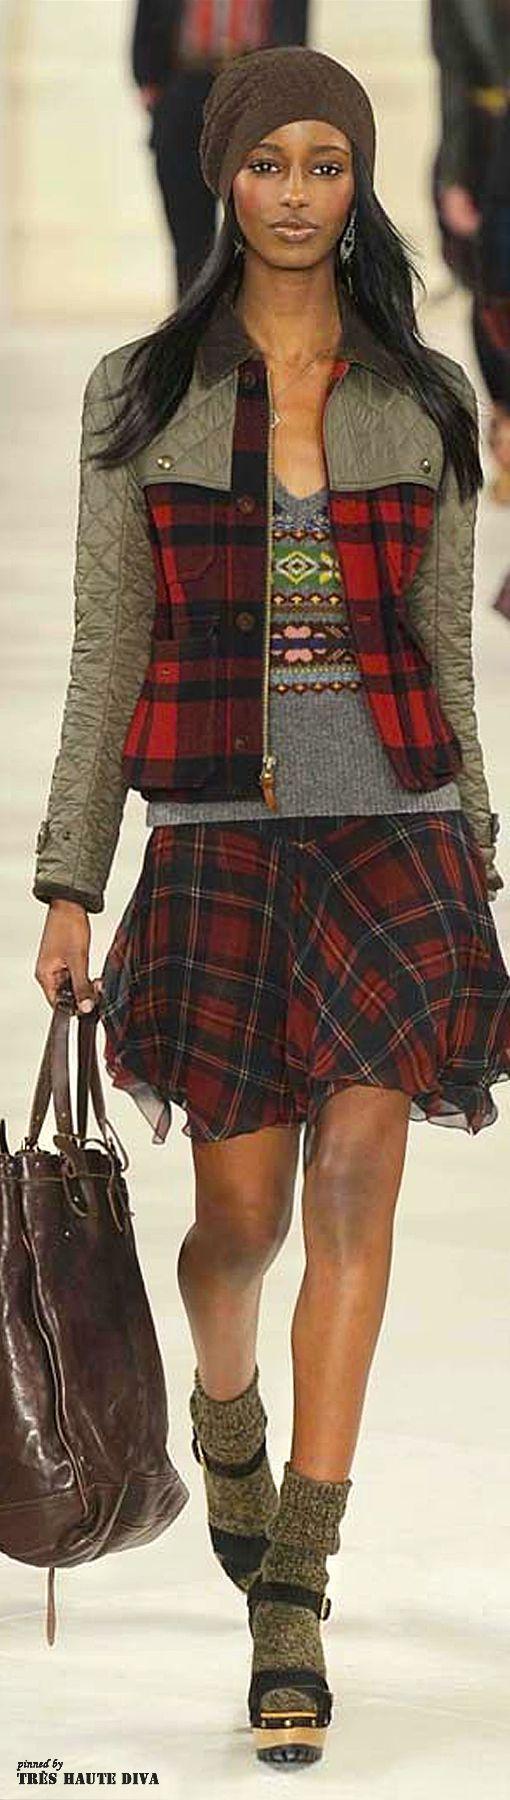 tartans for women by ralph lauren runway | Polo by Ralph Lauren Fall/Winter 2014 RTW http://www.wwd.com/runway ...